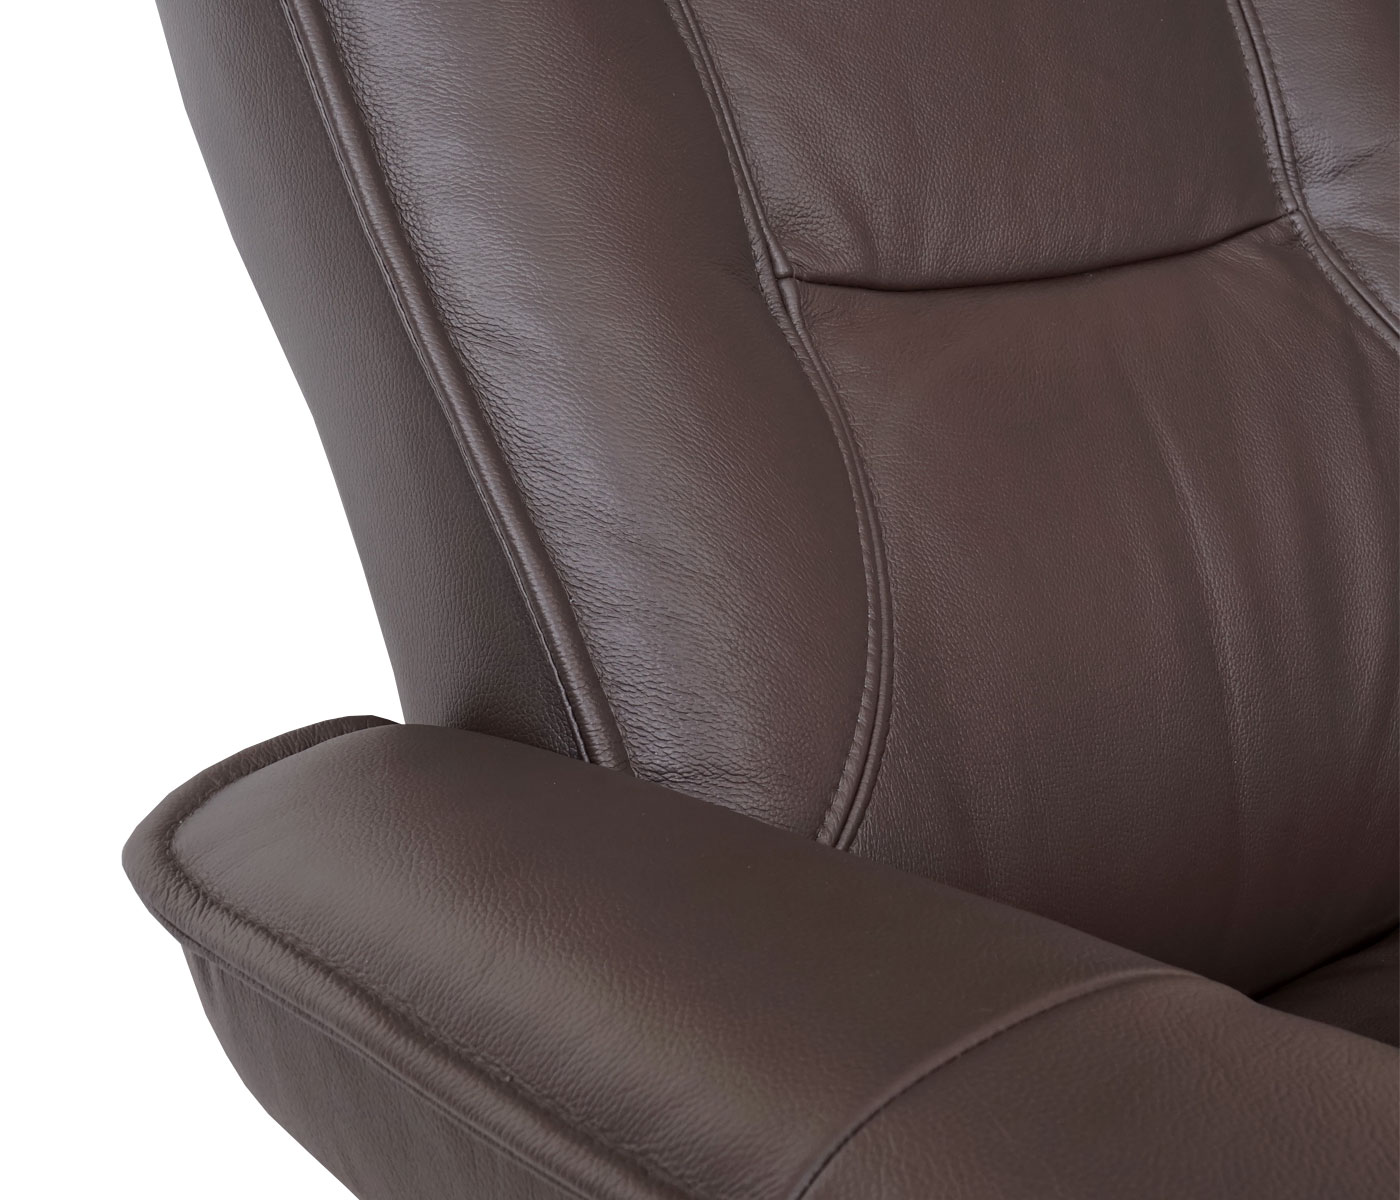 leder relaxsessel 360 drehbar mit hocker tv sessel fernsehsessel braun 56051 ebay. Black Bedroom Furniture Sets. Home Design Ideas